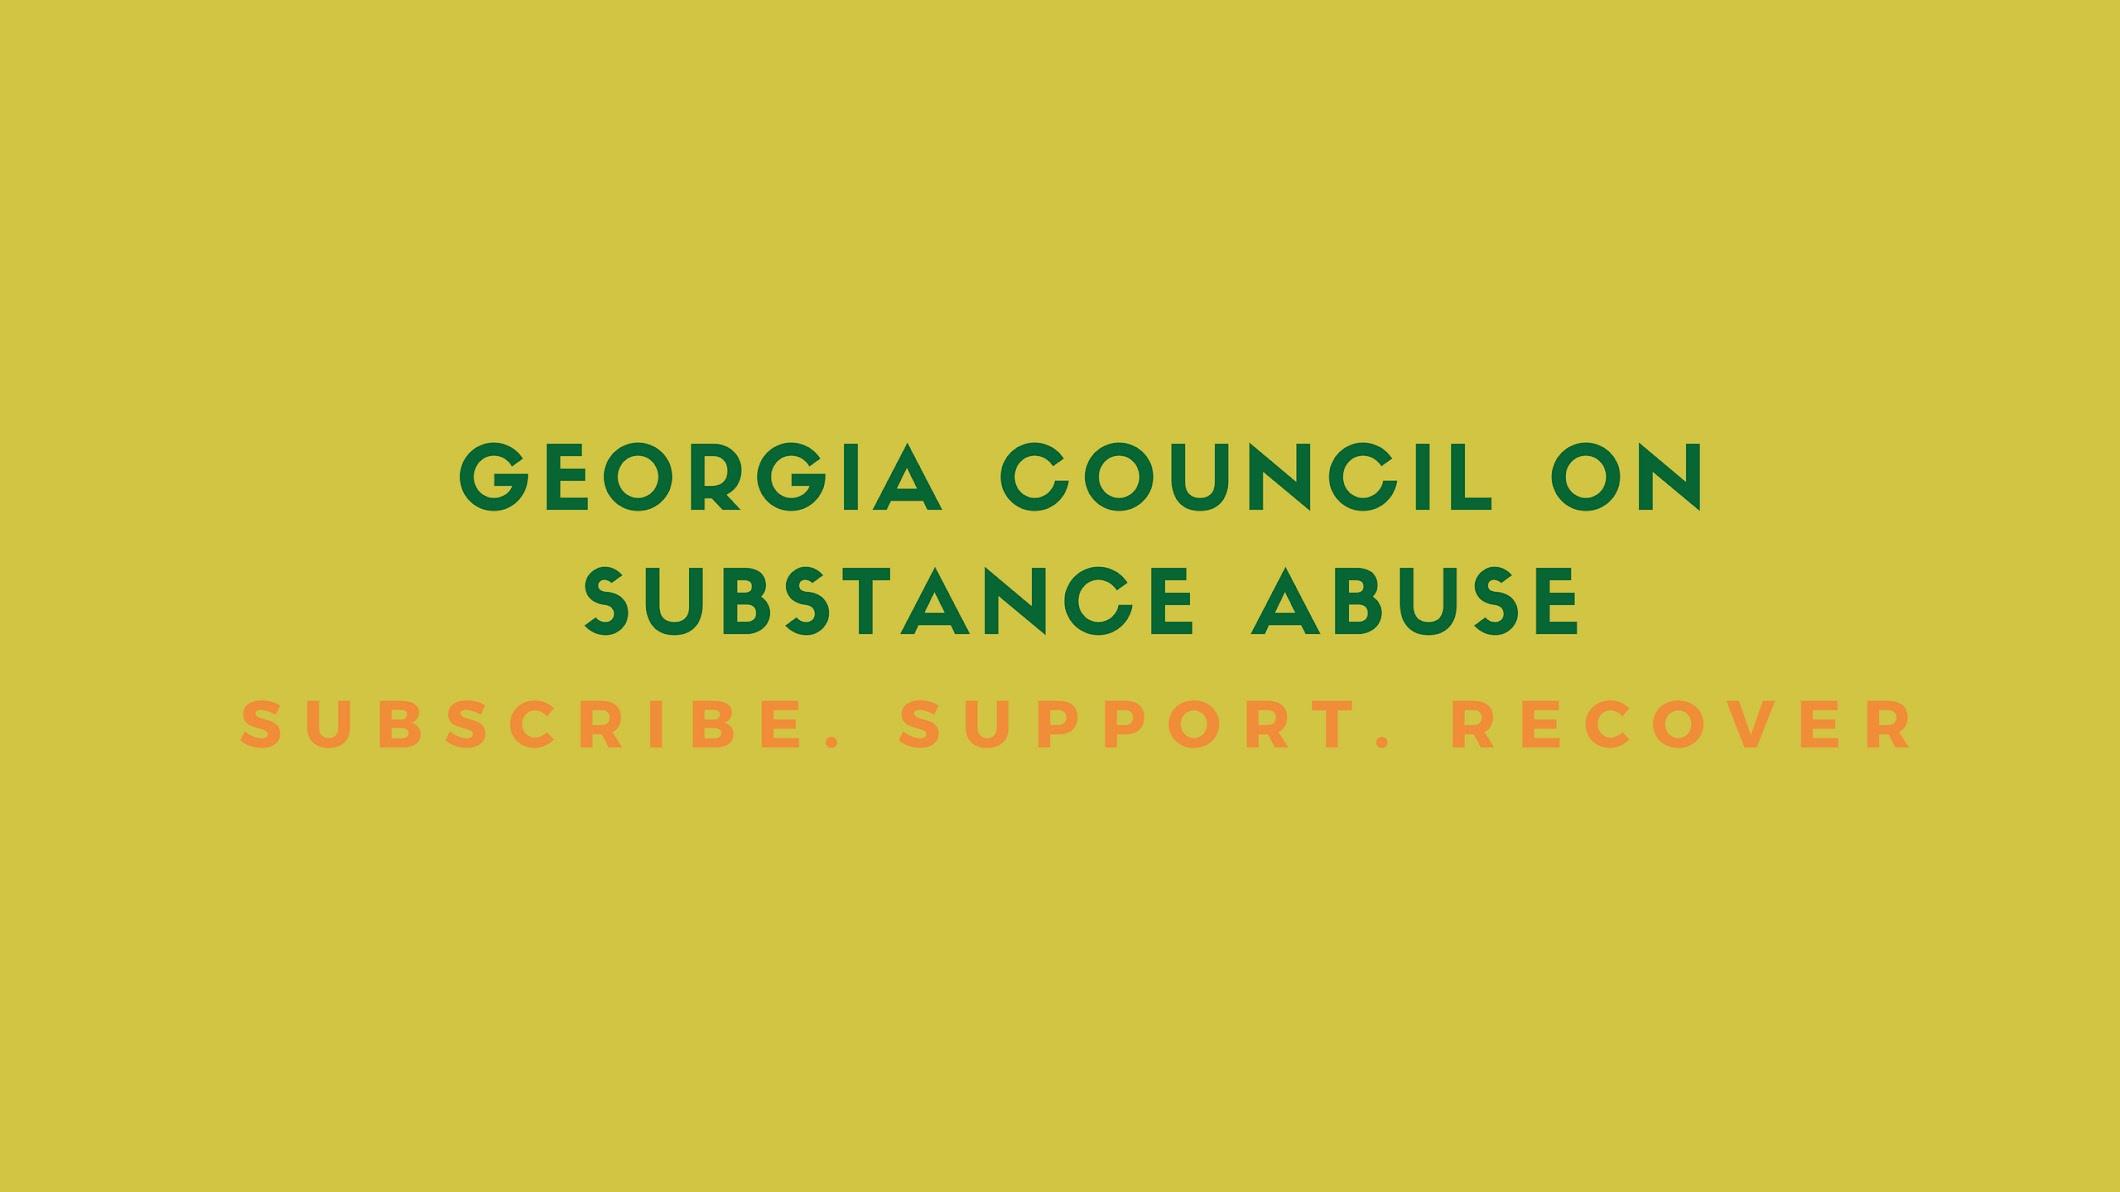 Georgia Council on Substance Abuse